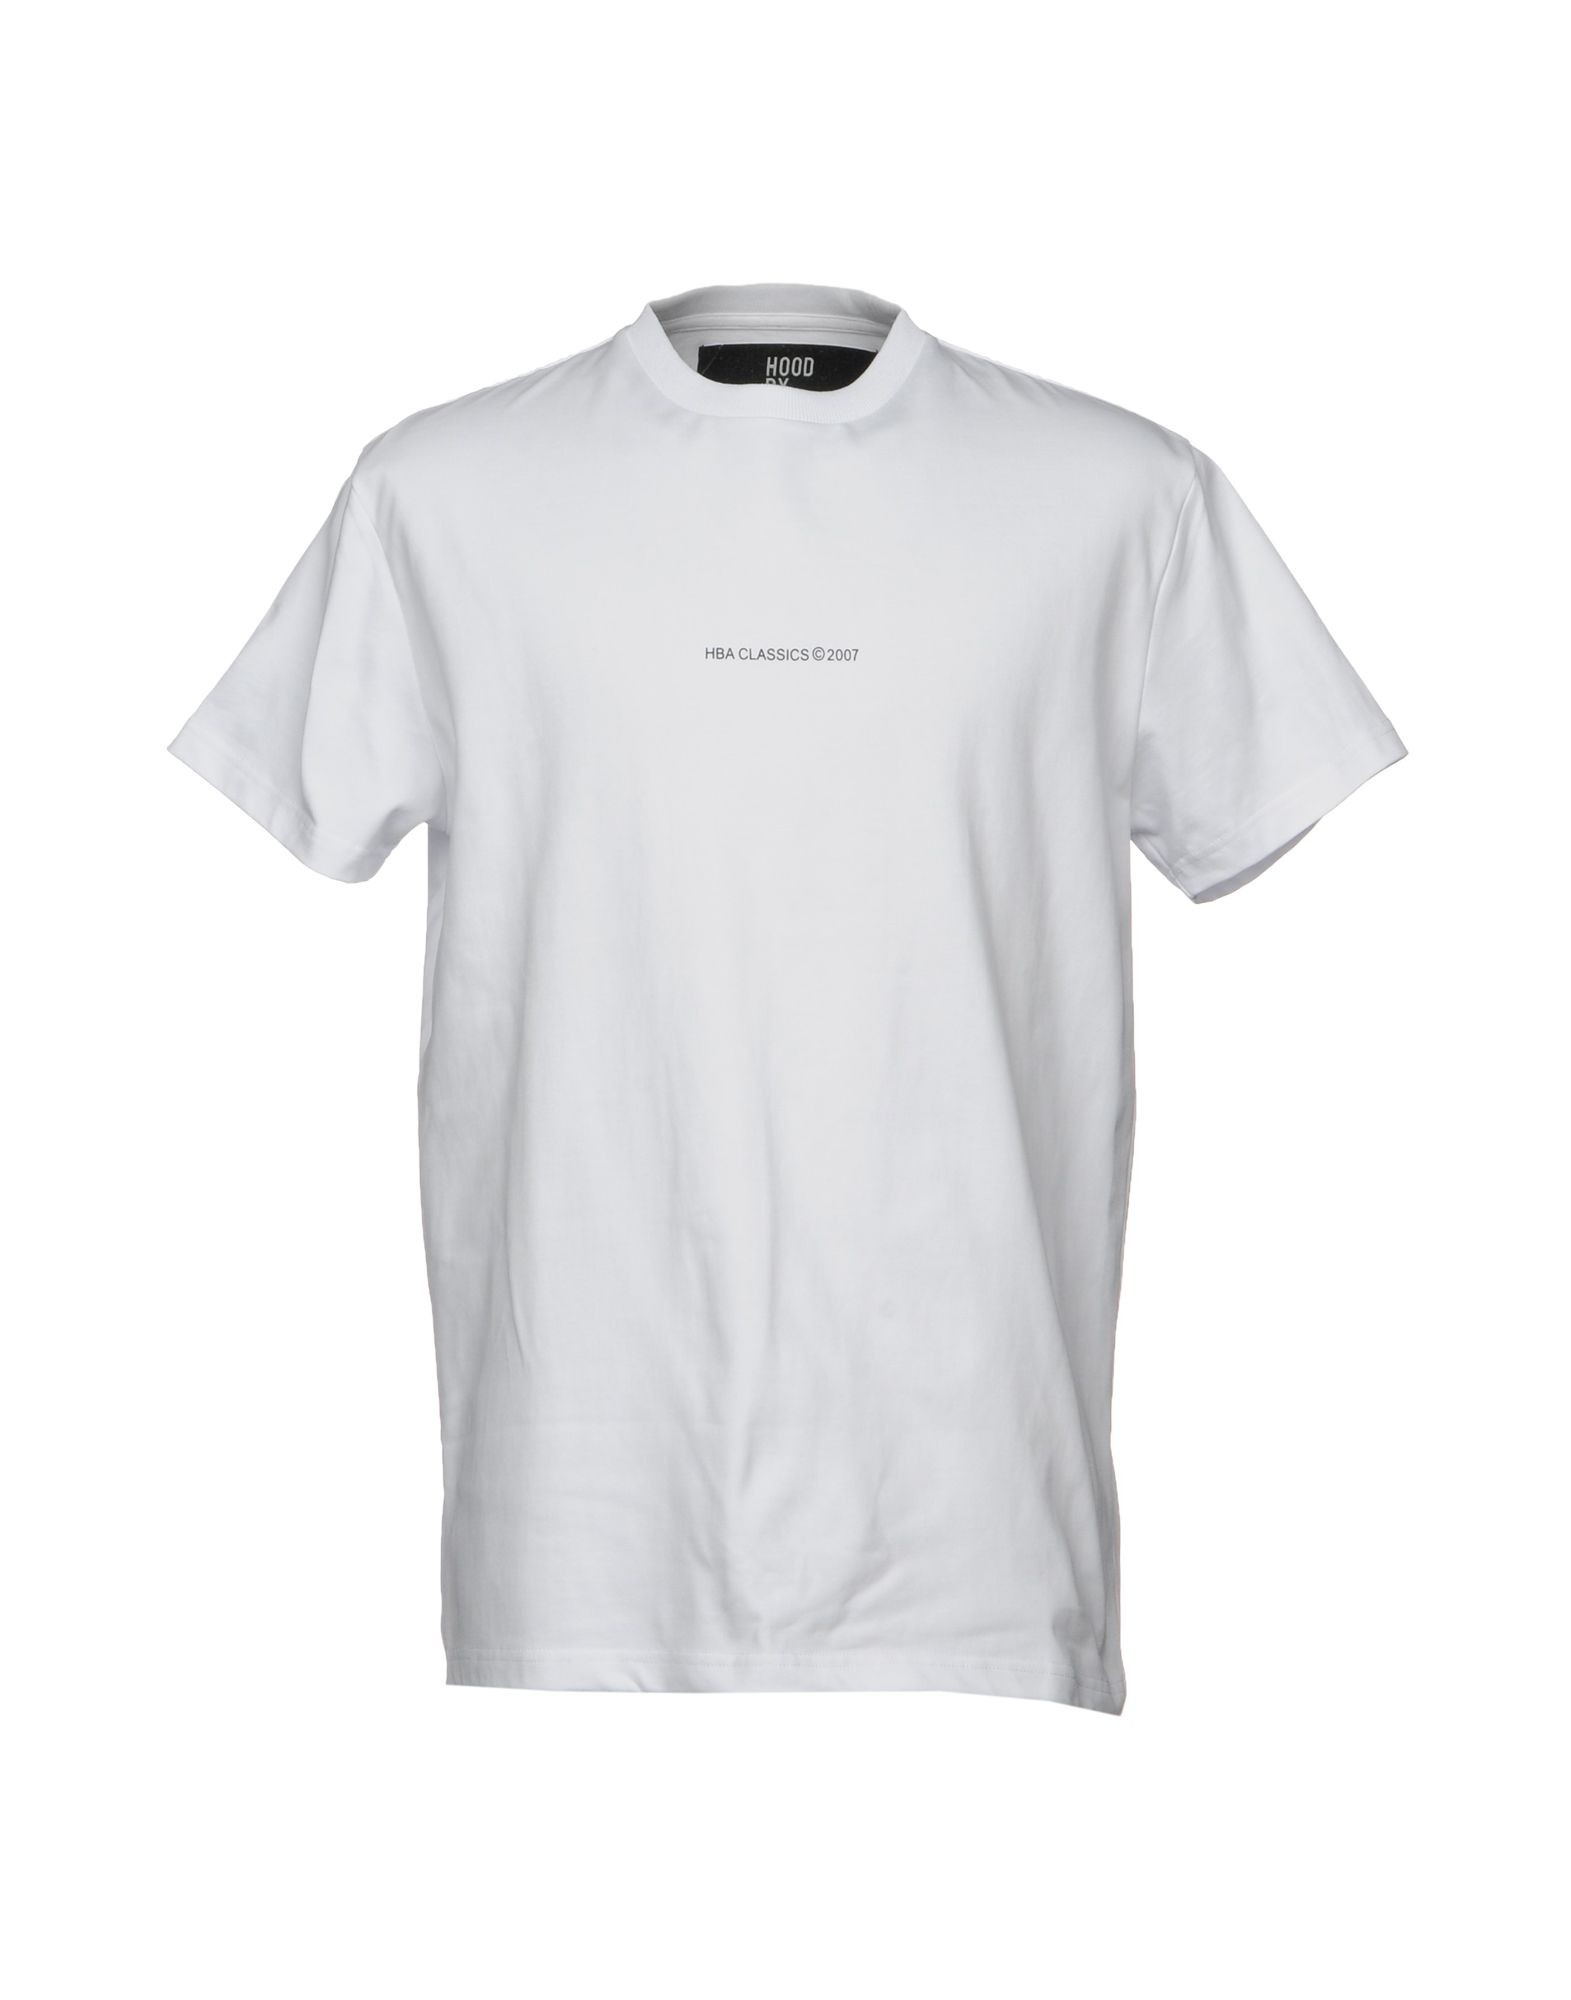 T-Shirt Hba  Hood By Air Uomo - Acquista online su